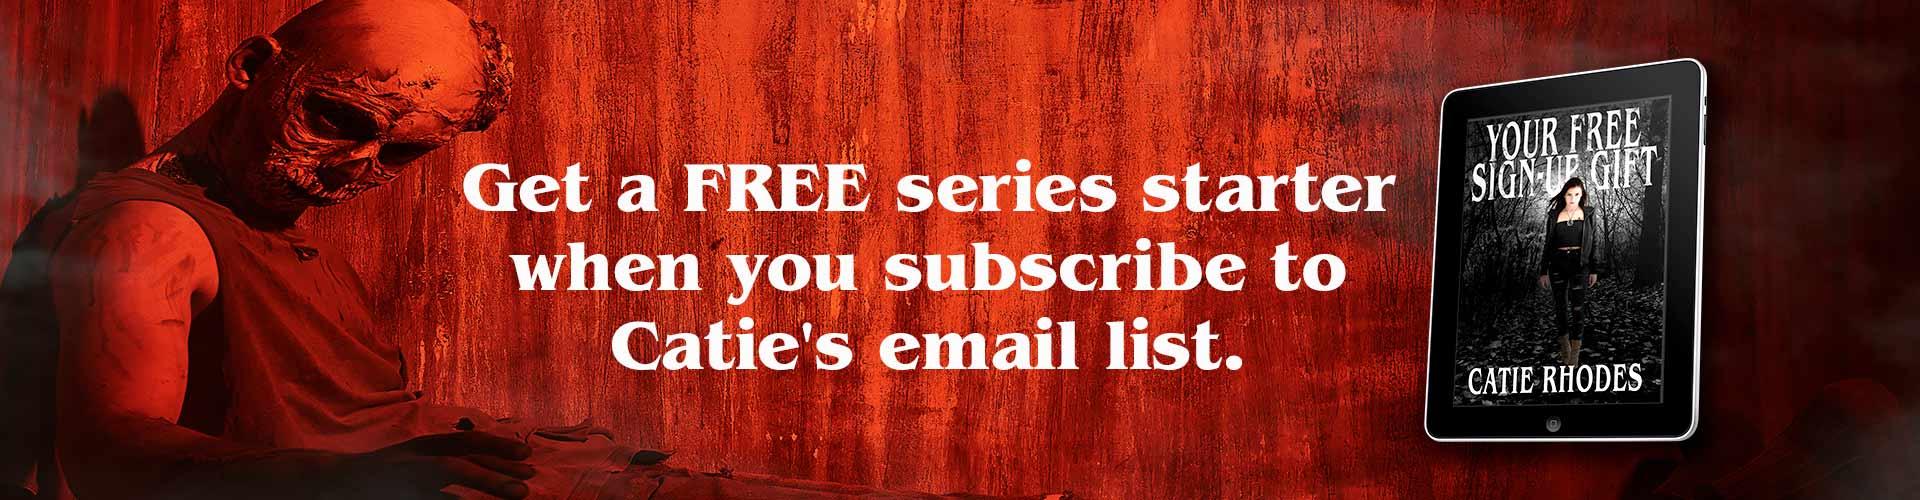 Get a free series starter